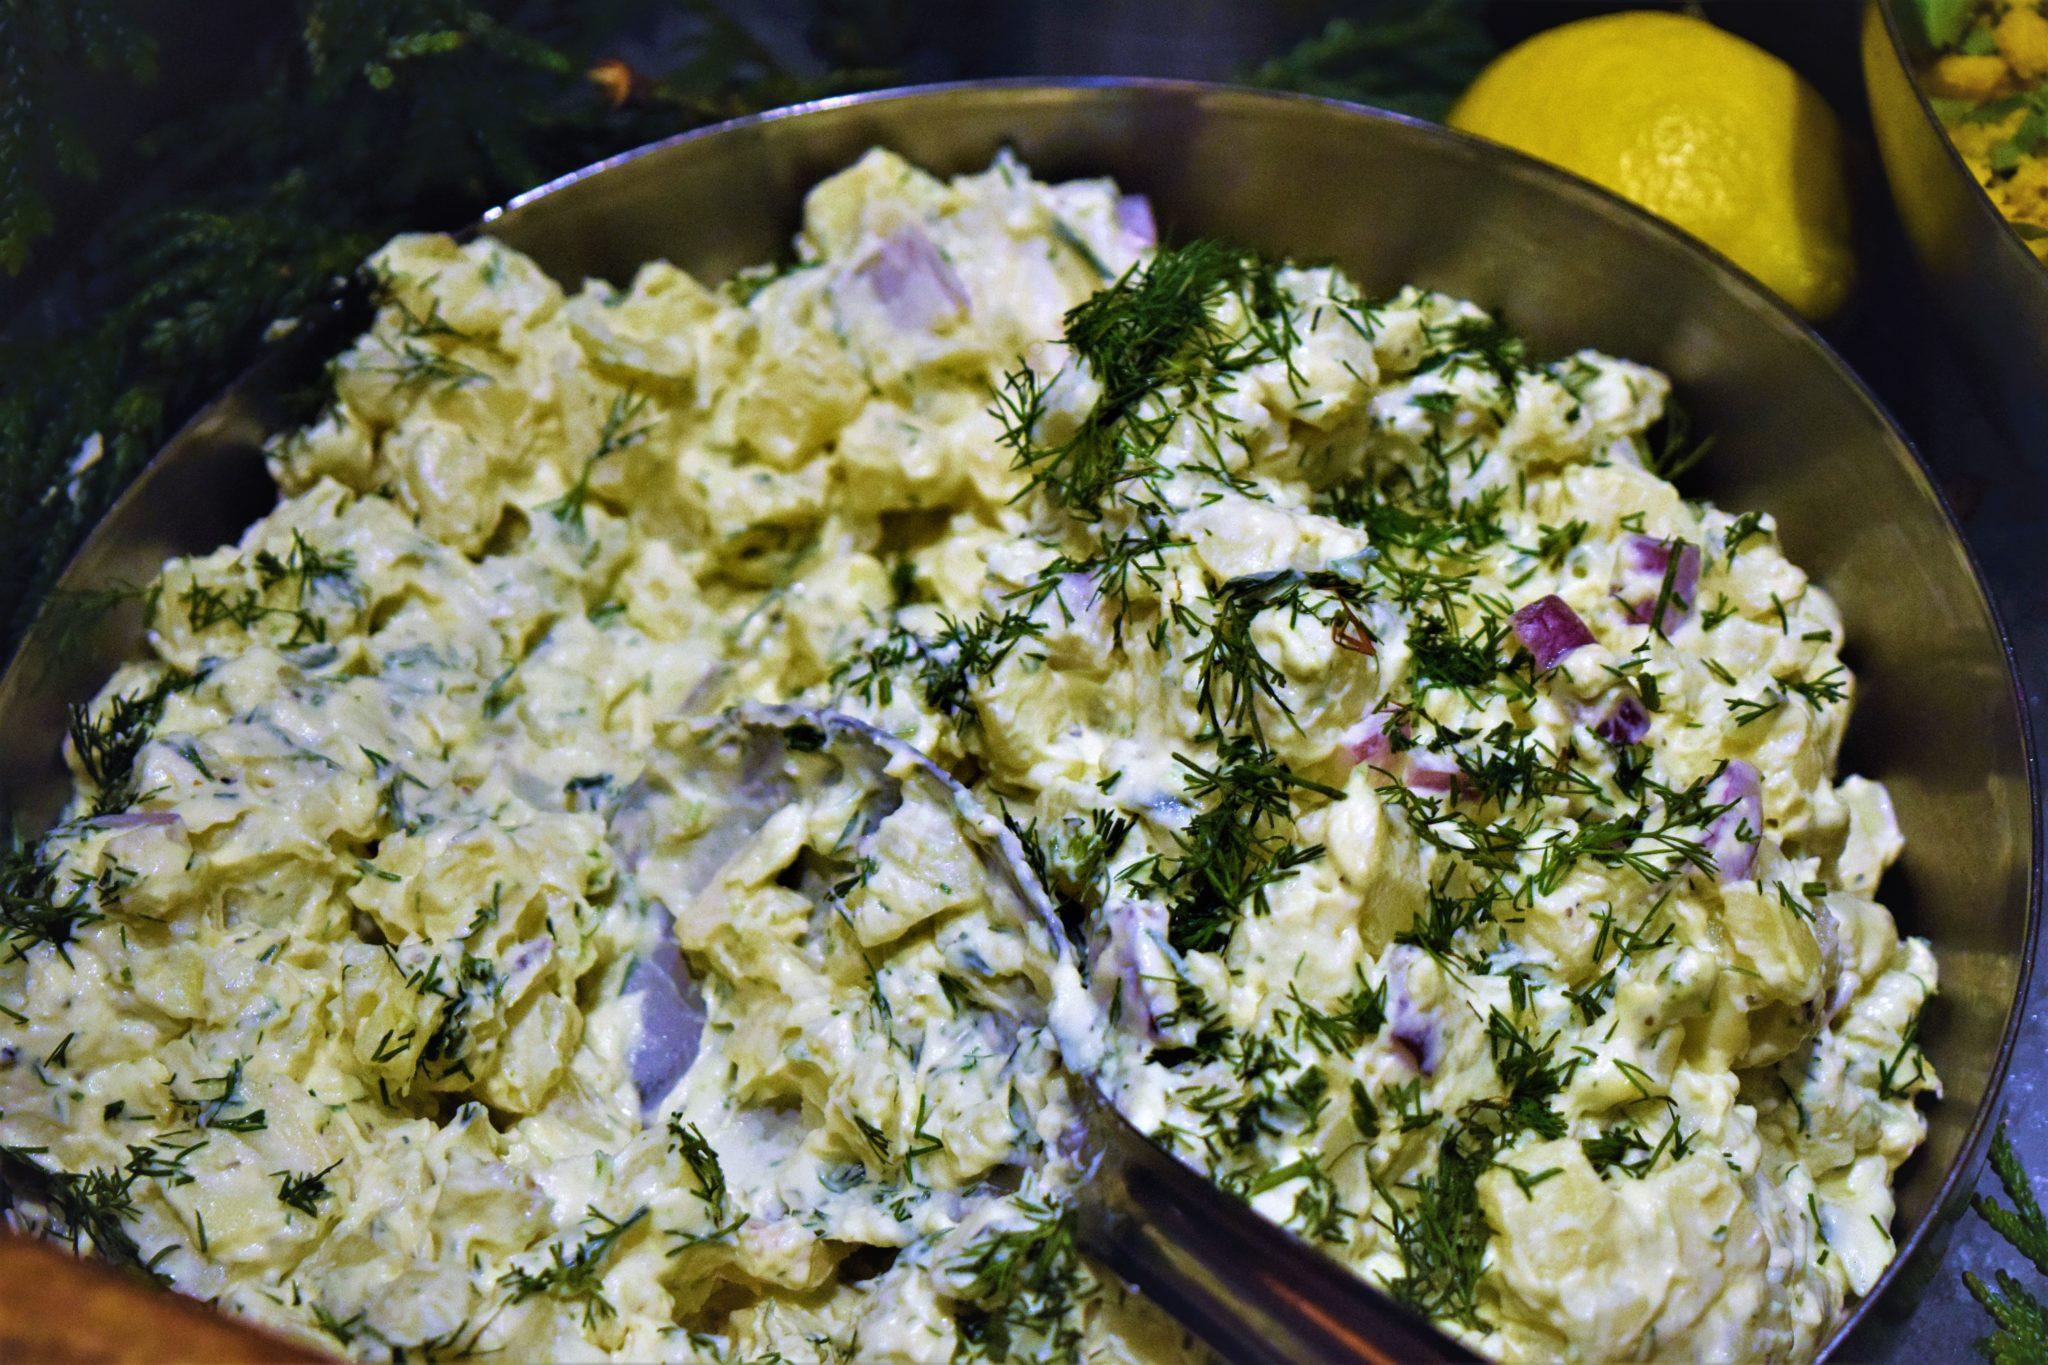 Potato salad, hermans vegan buffet, stockholm, sweden